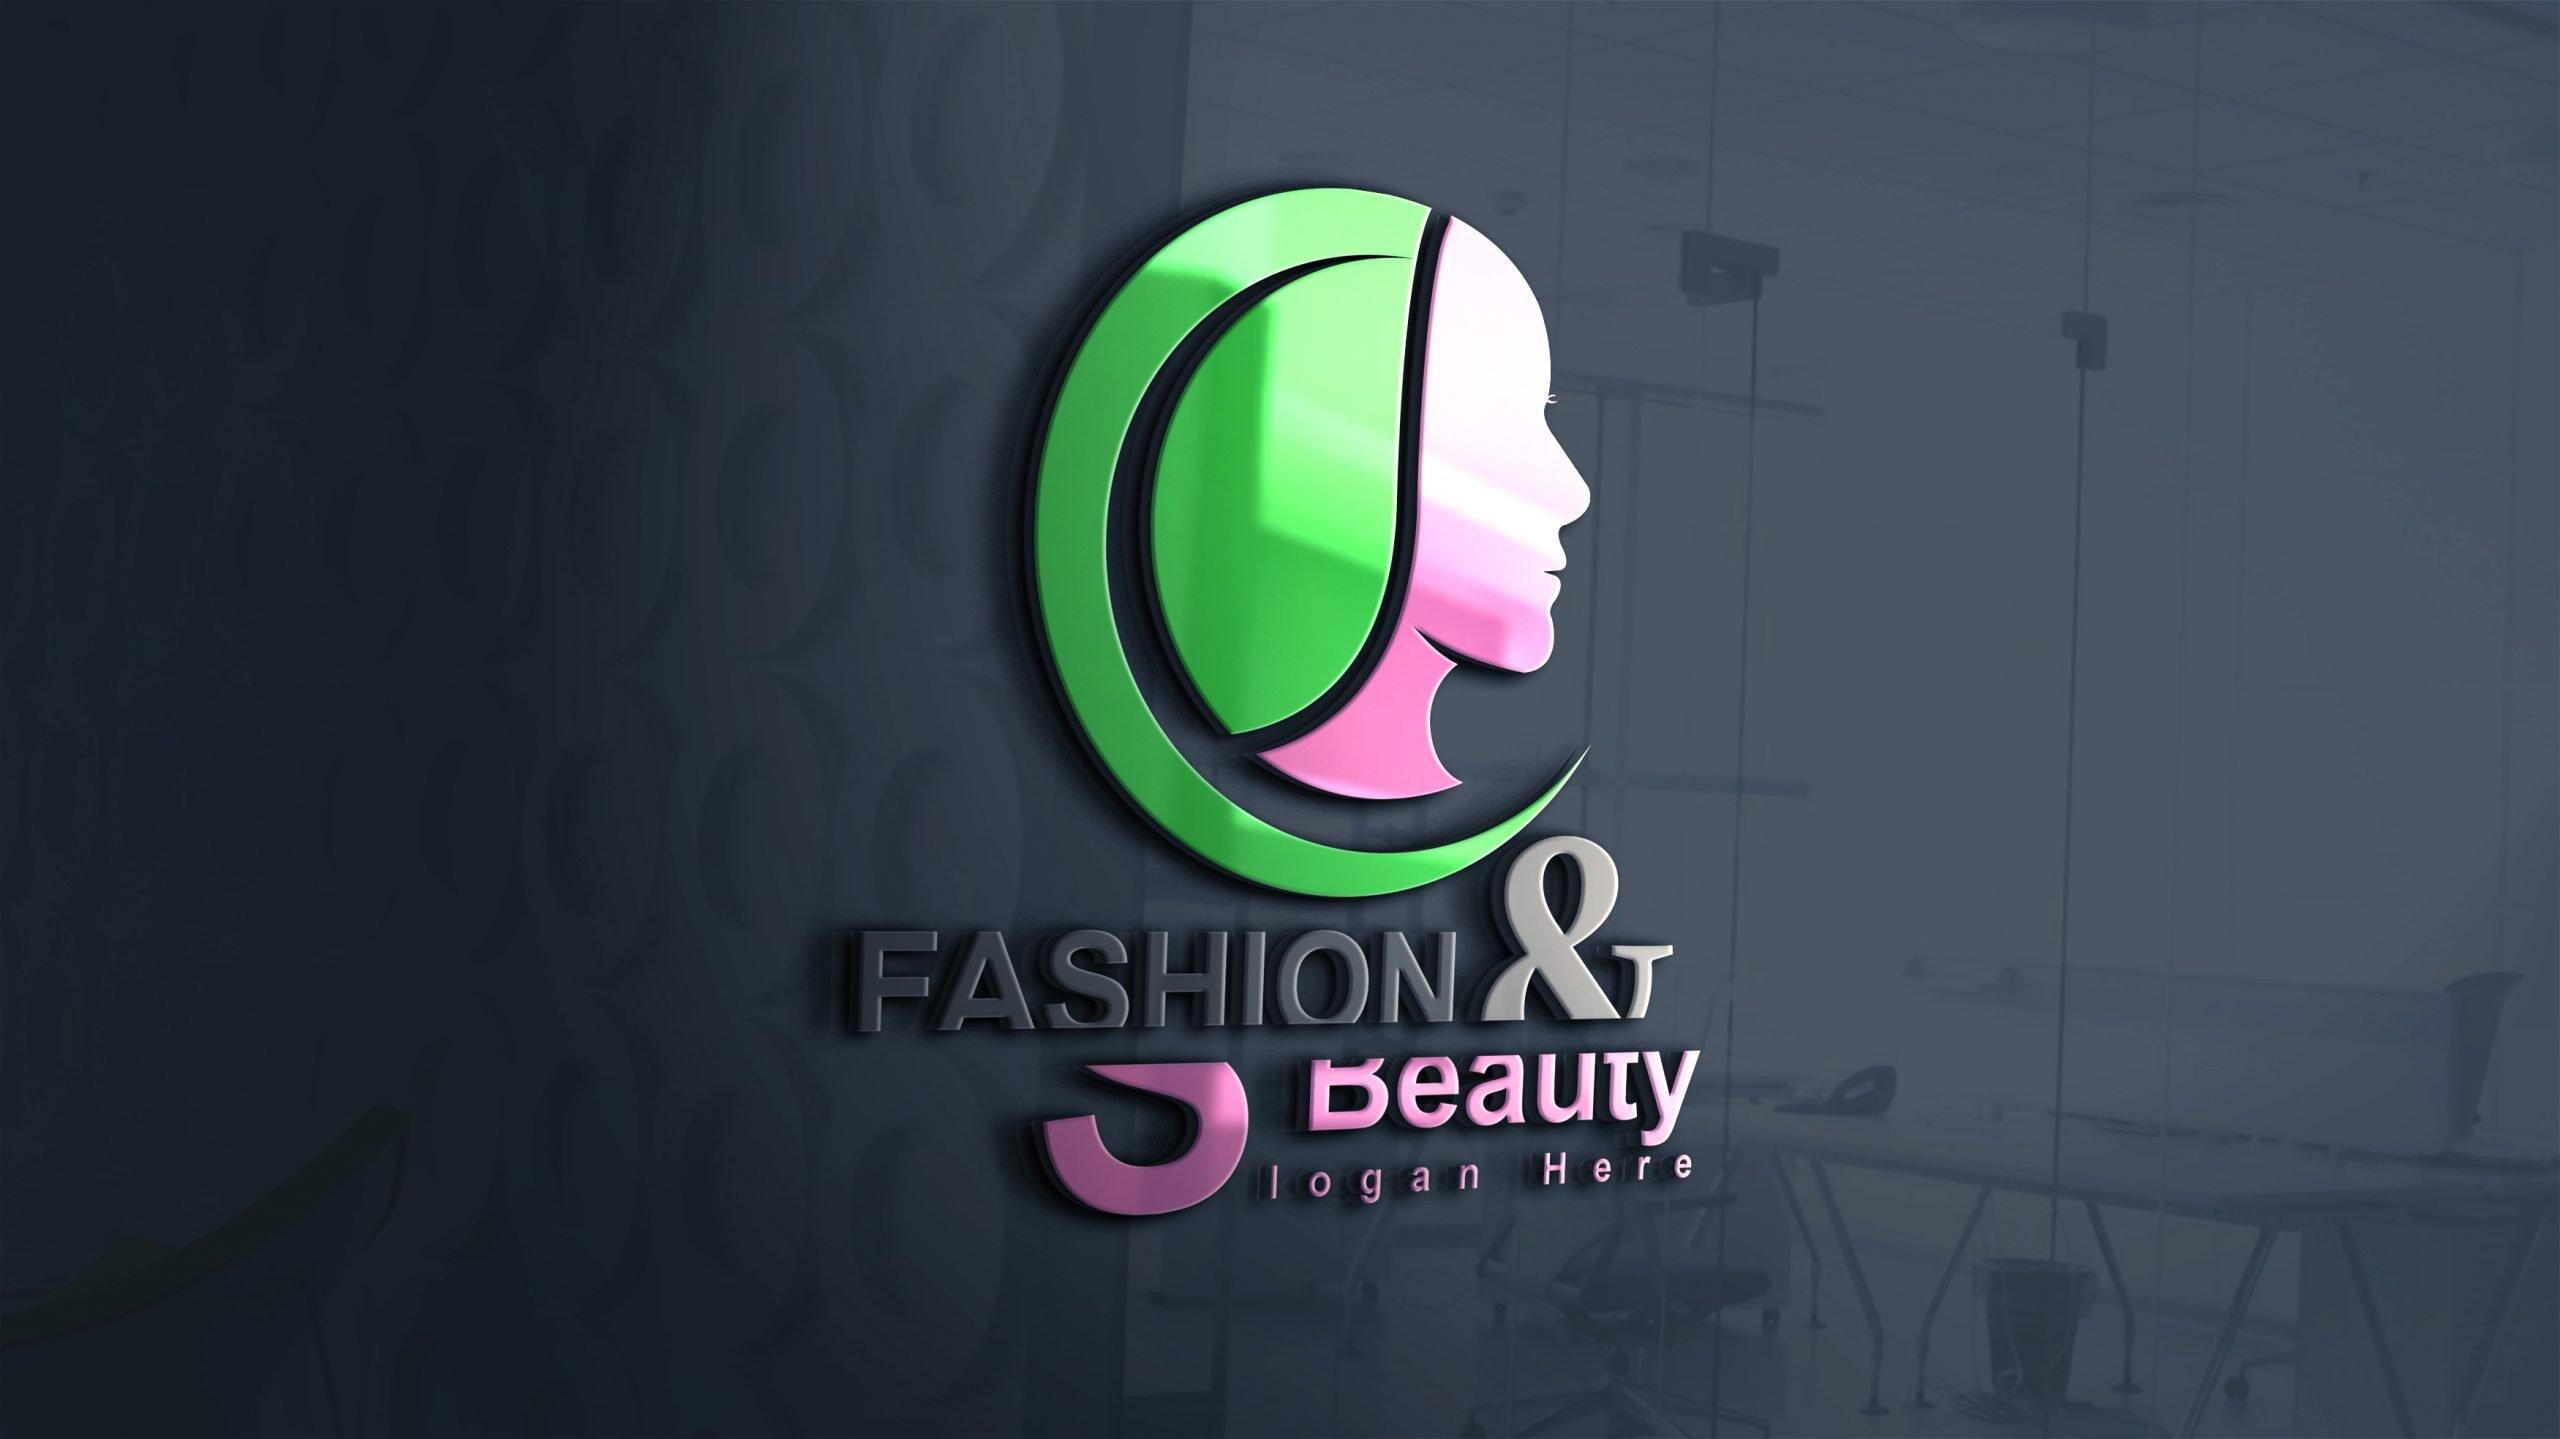 Fashion & Beauty Design